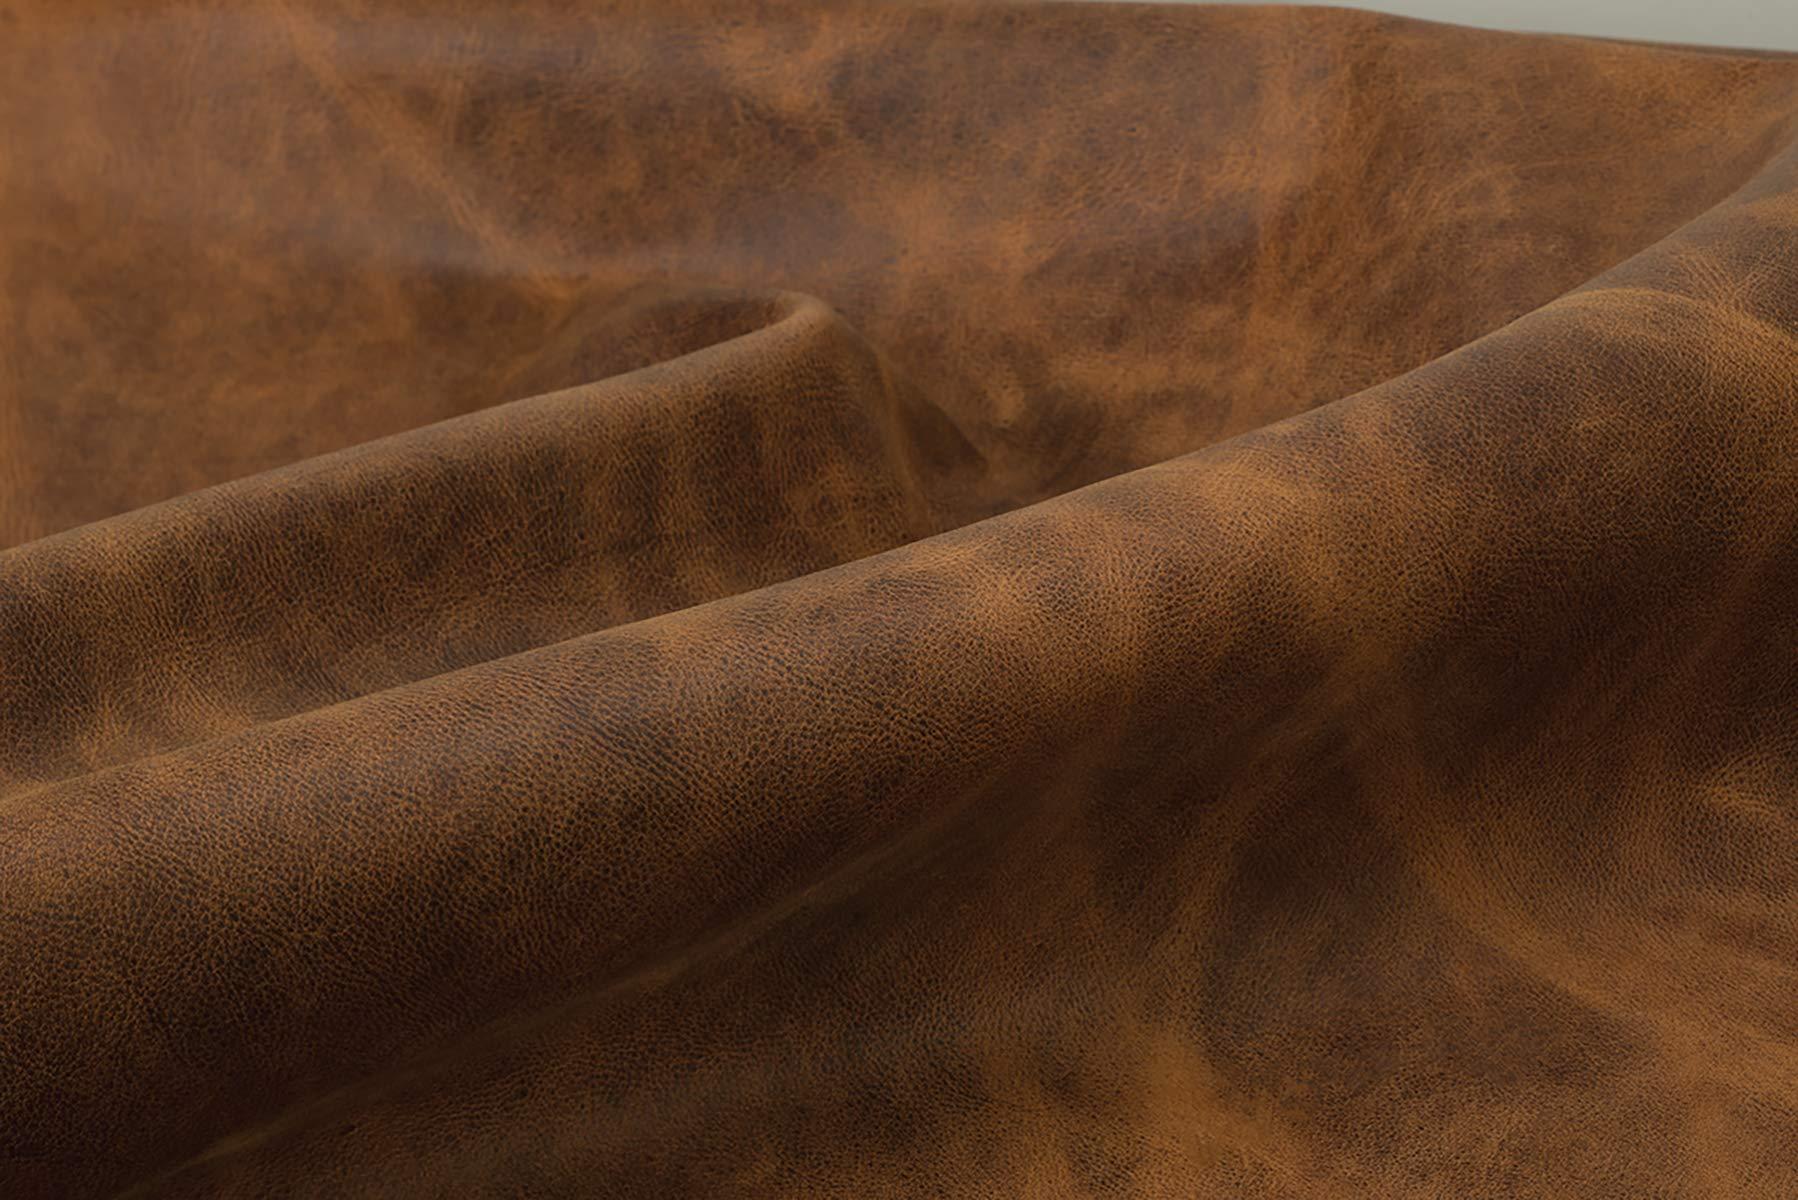 Water Buffalo Leather, Crazy Horse, 4-5 oz.